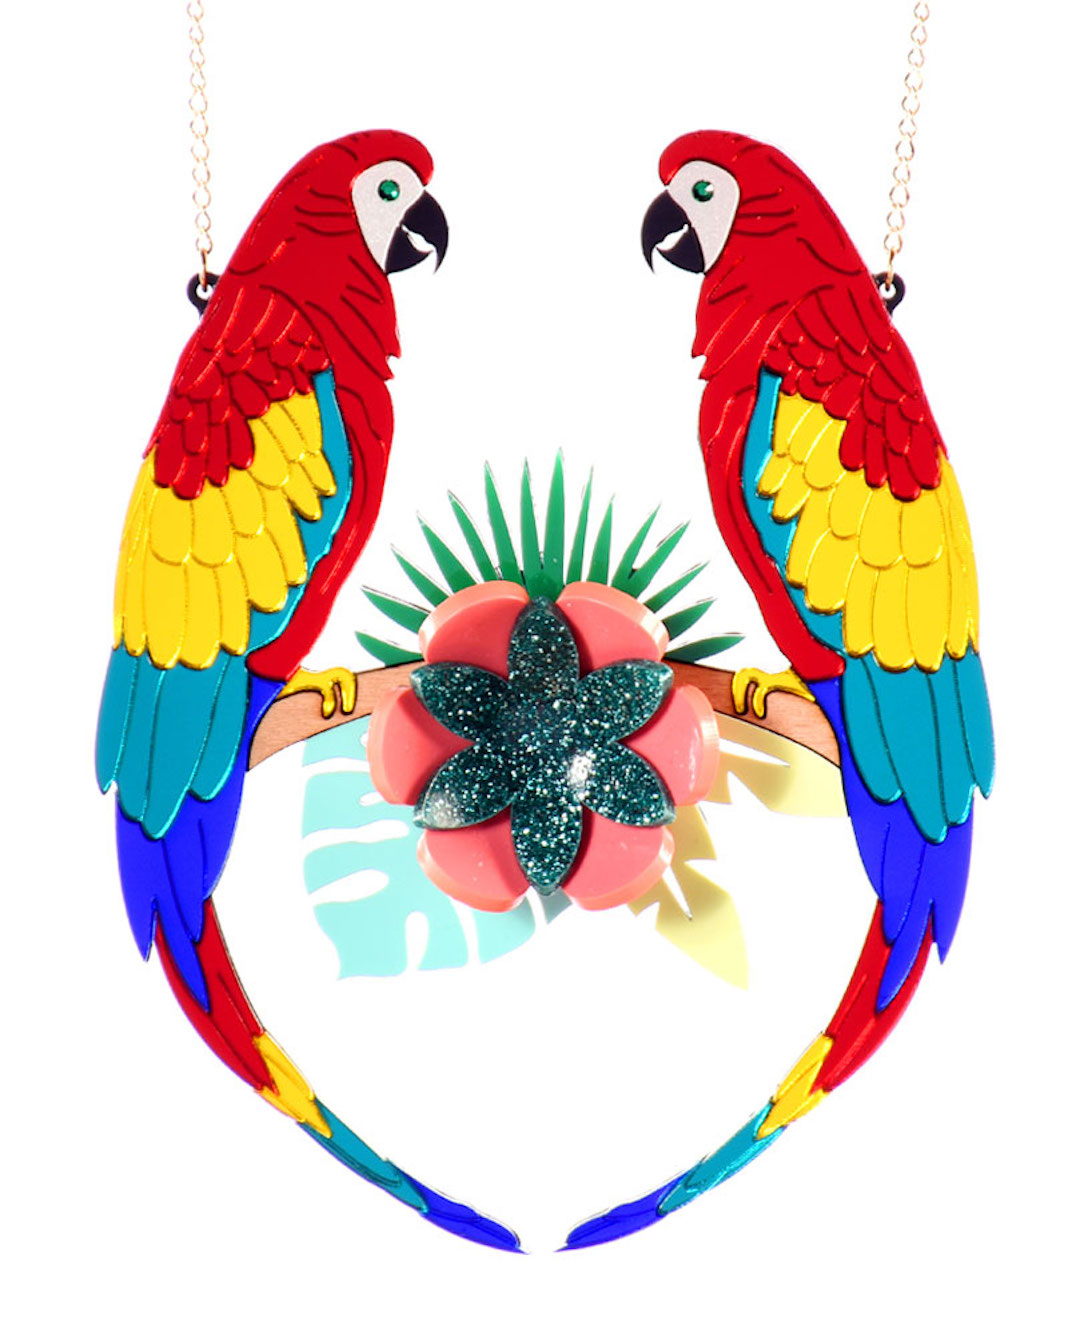 The best statement necklaces by La Vidriola